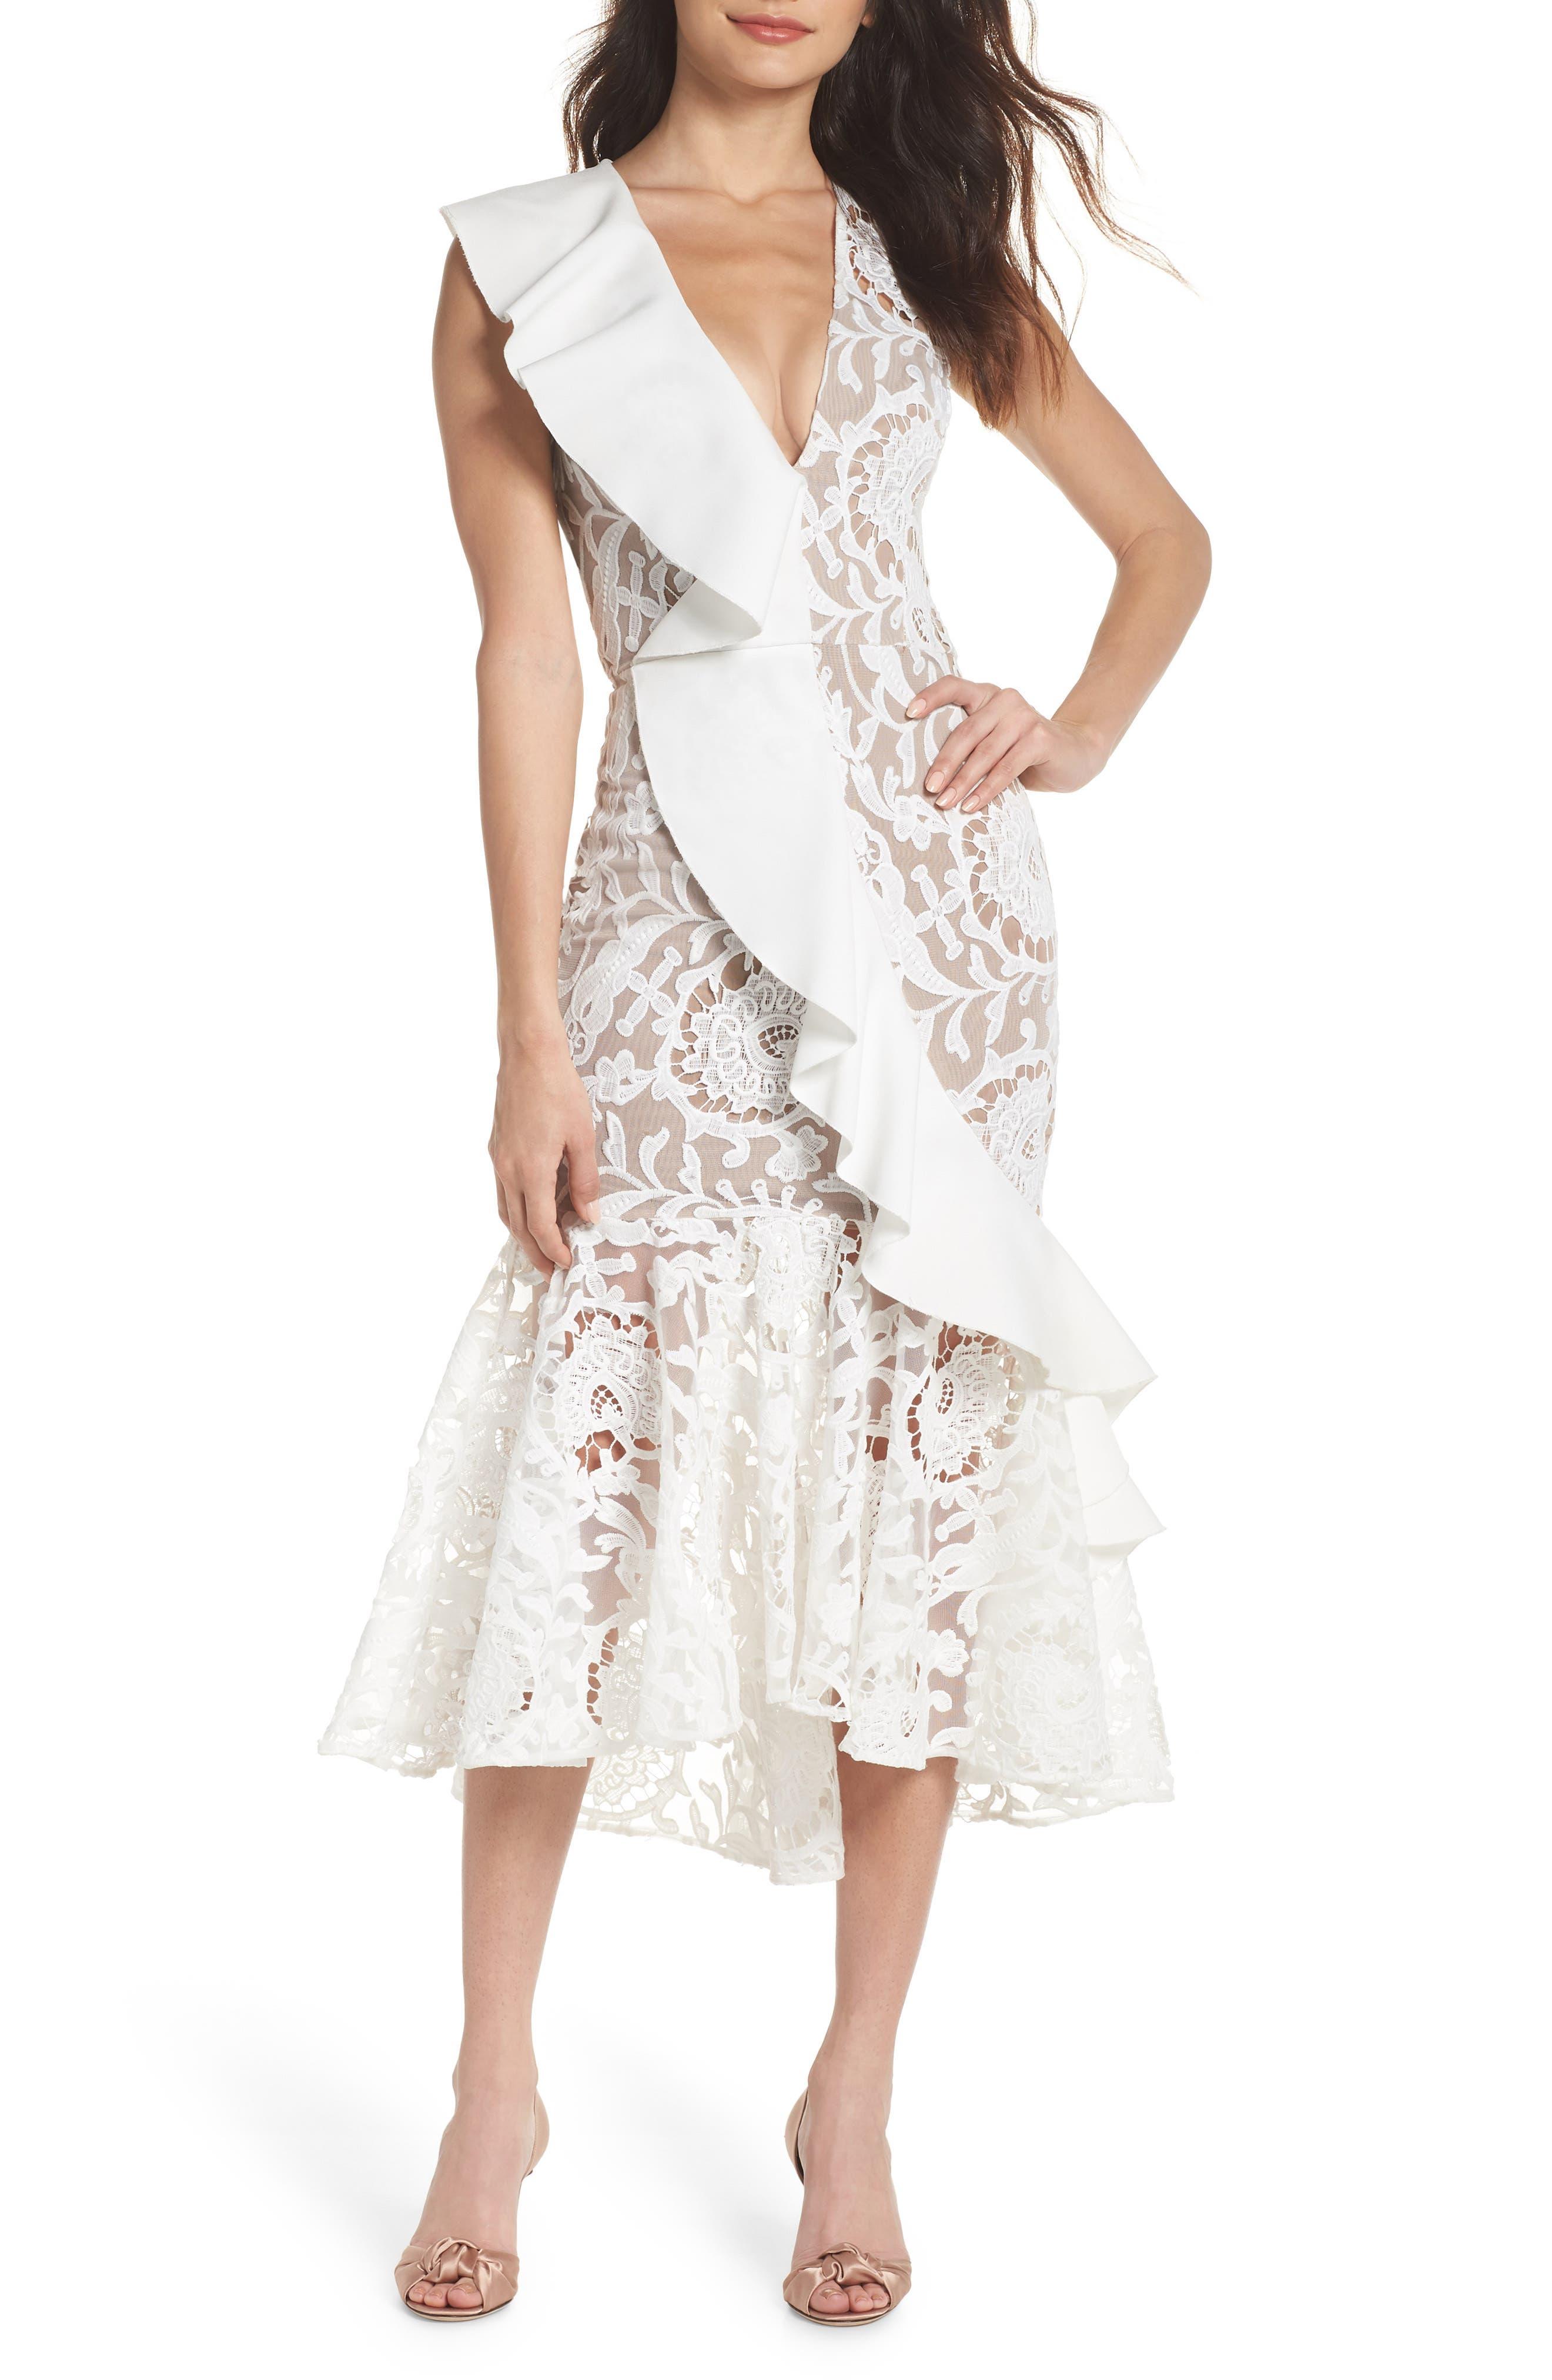 Rocha Waterfall Ruffle Lace Midi Dress,                         Main,                         color, 900